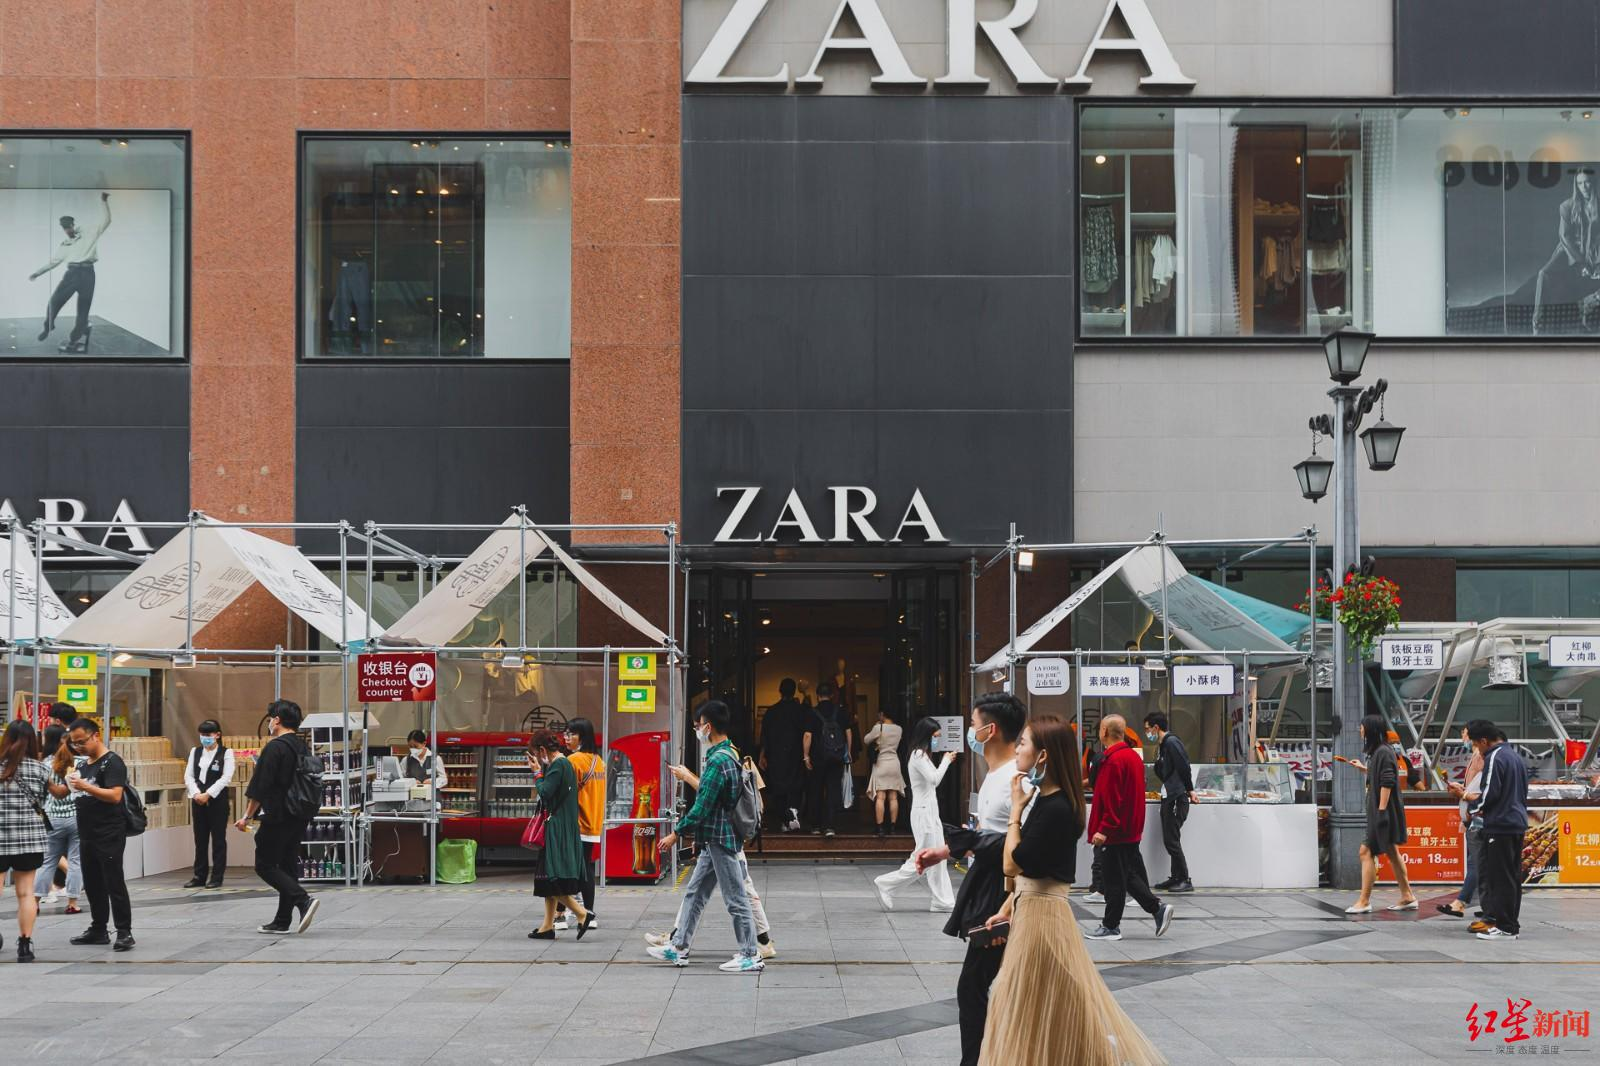 ZARA母公司宣布关店千余家,成都门店是否受影响?